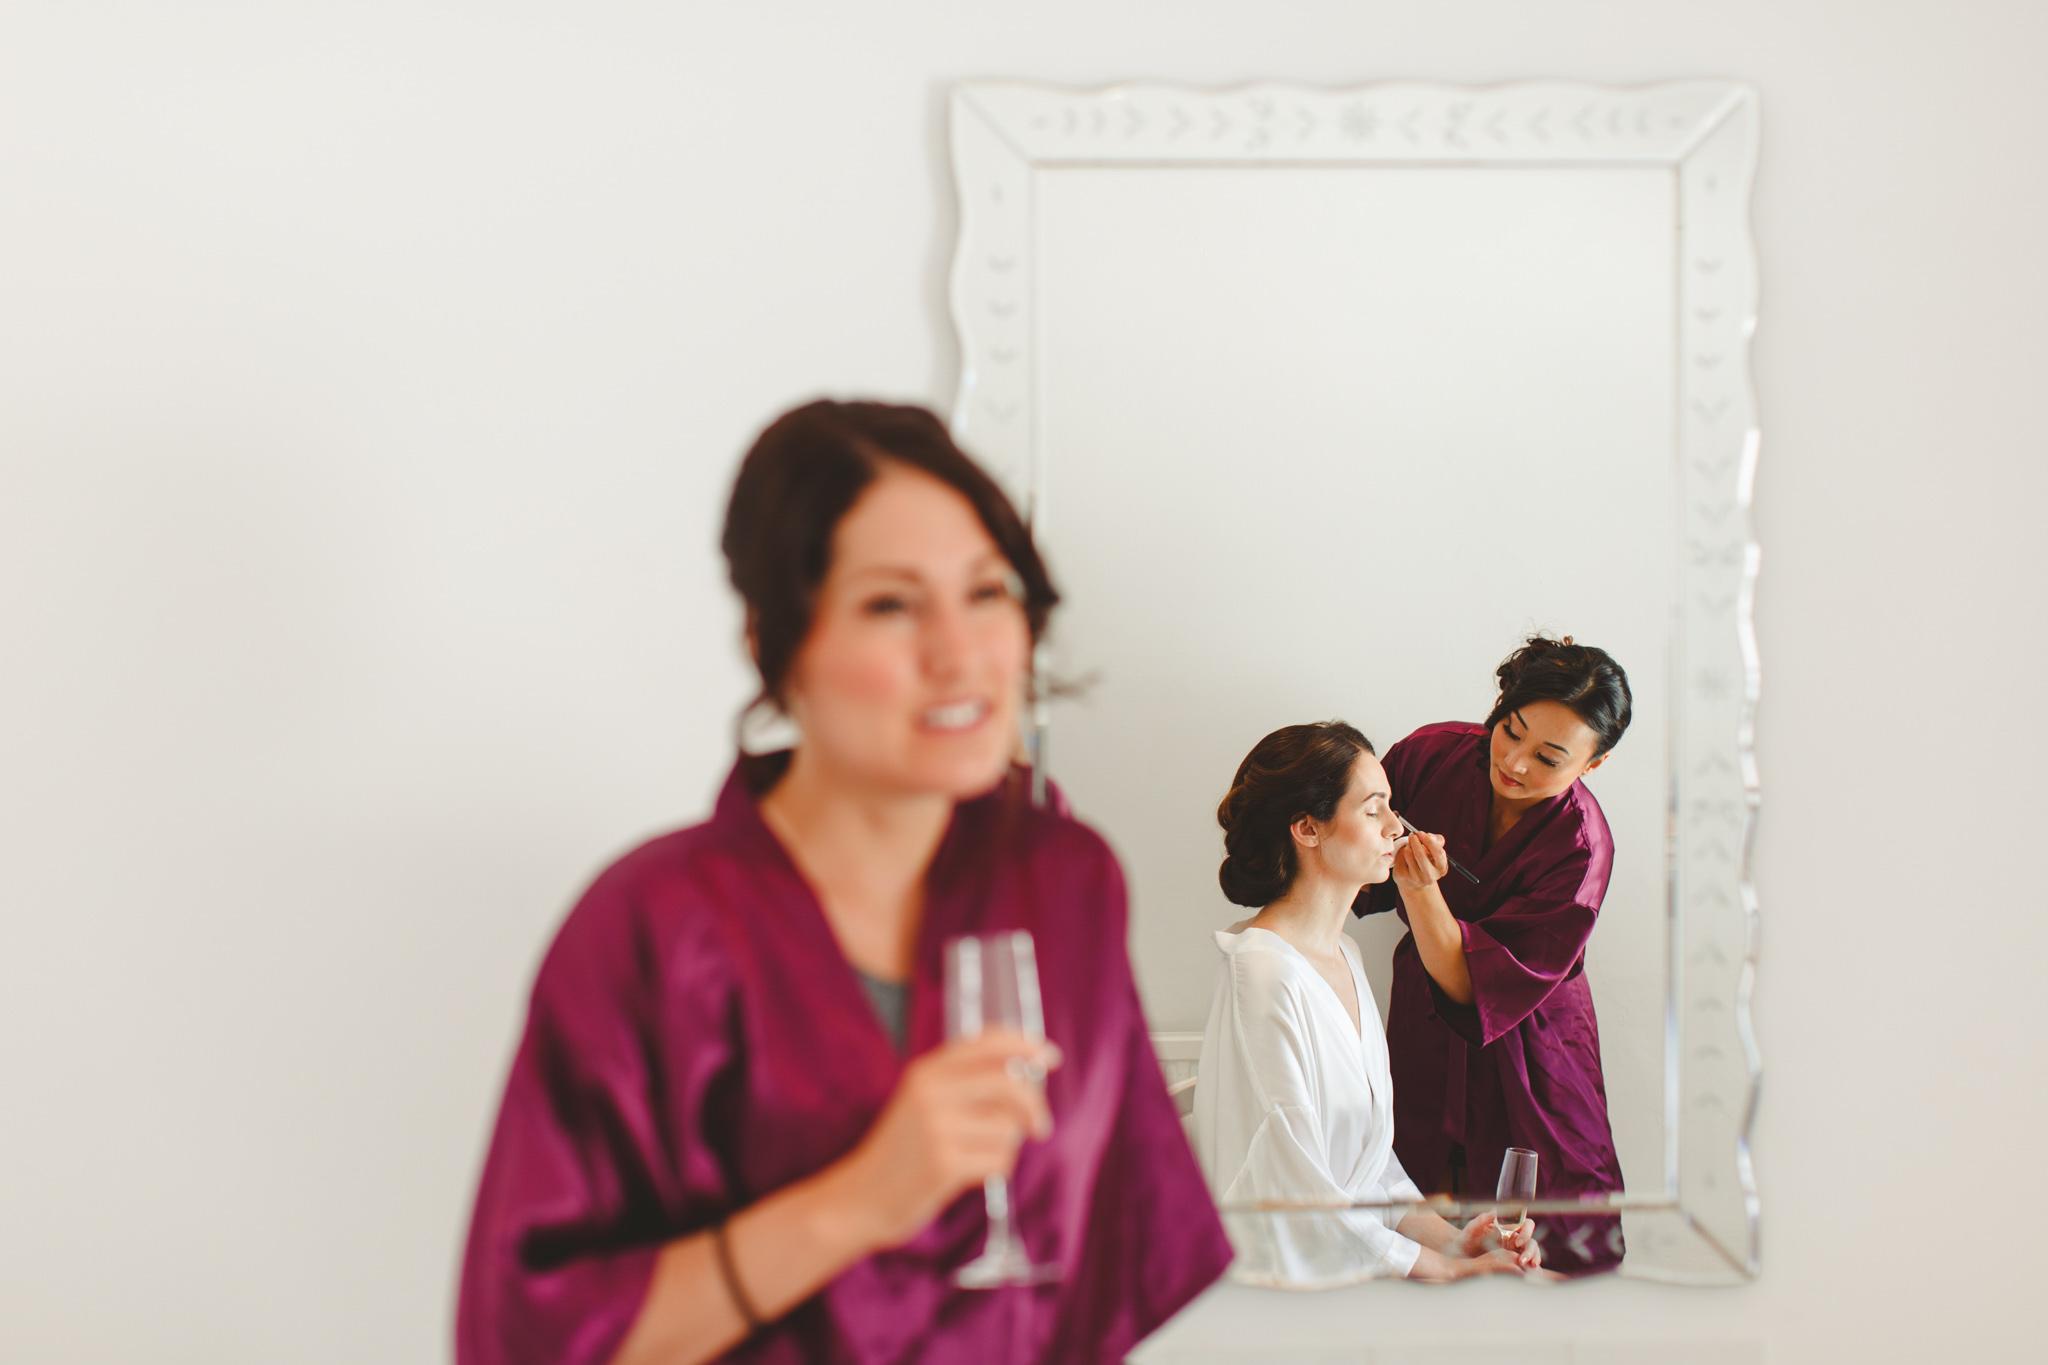 derbyshire-wedding-photographer-videographer-camera-hannah-77.jpg